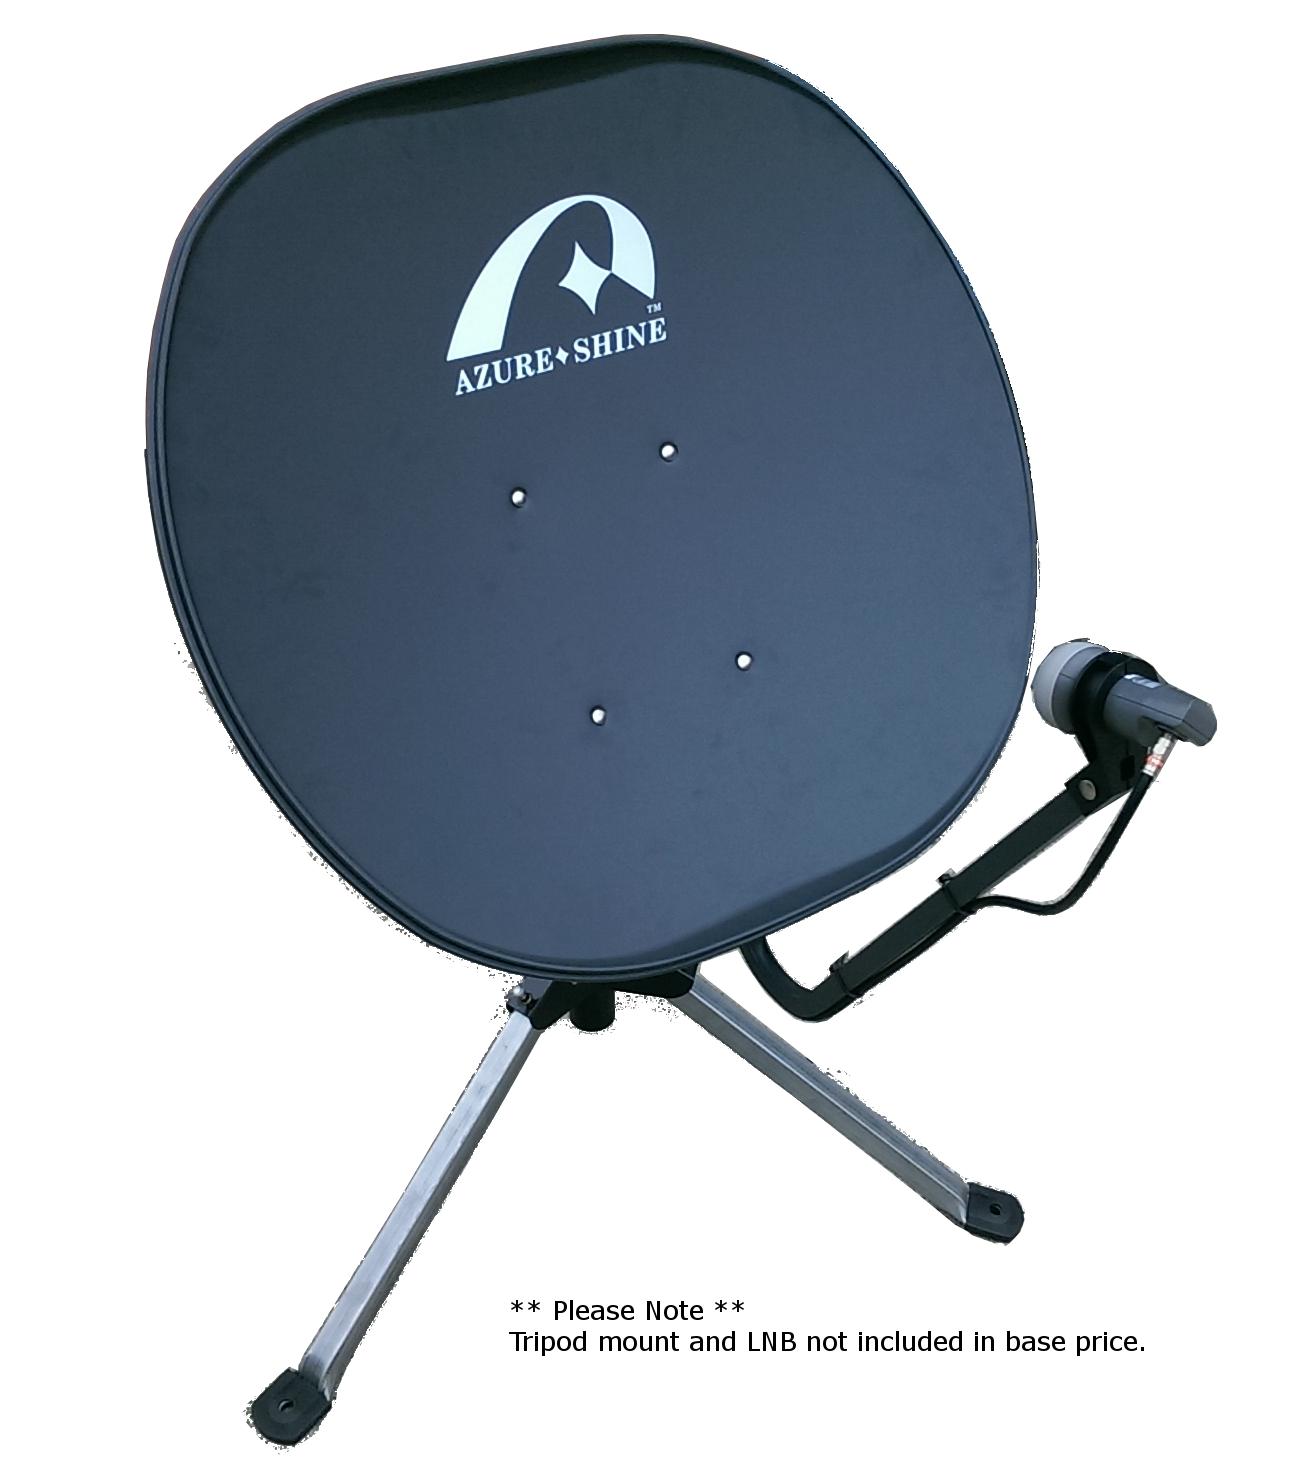 Tripod Mounted Satellite Dish Satellite Tv Tv Reception Satellites